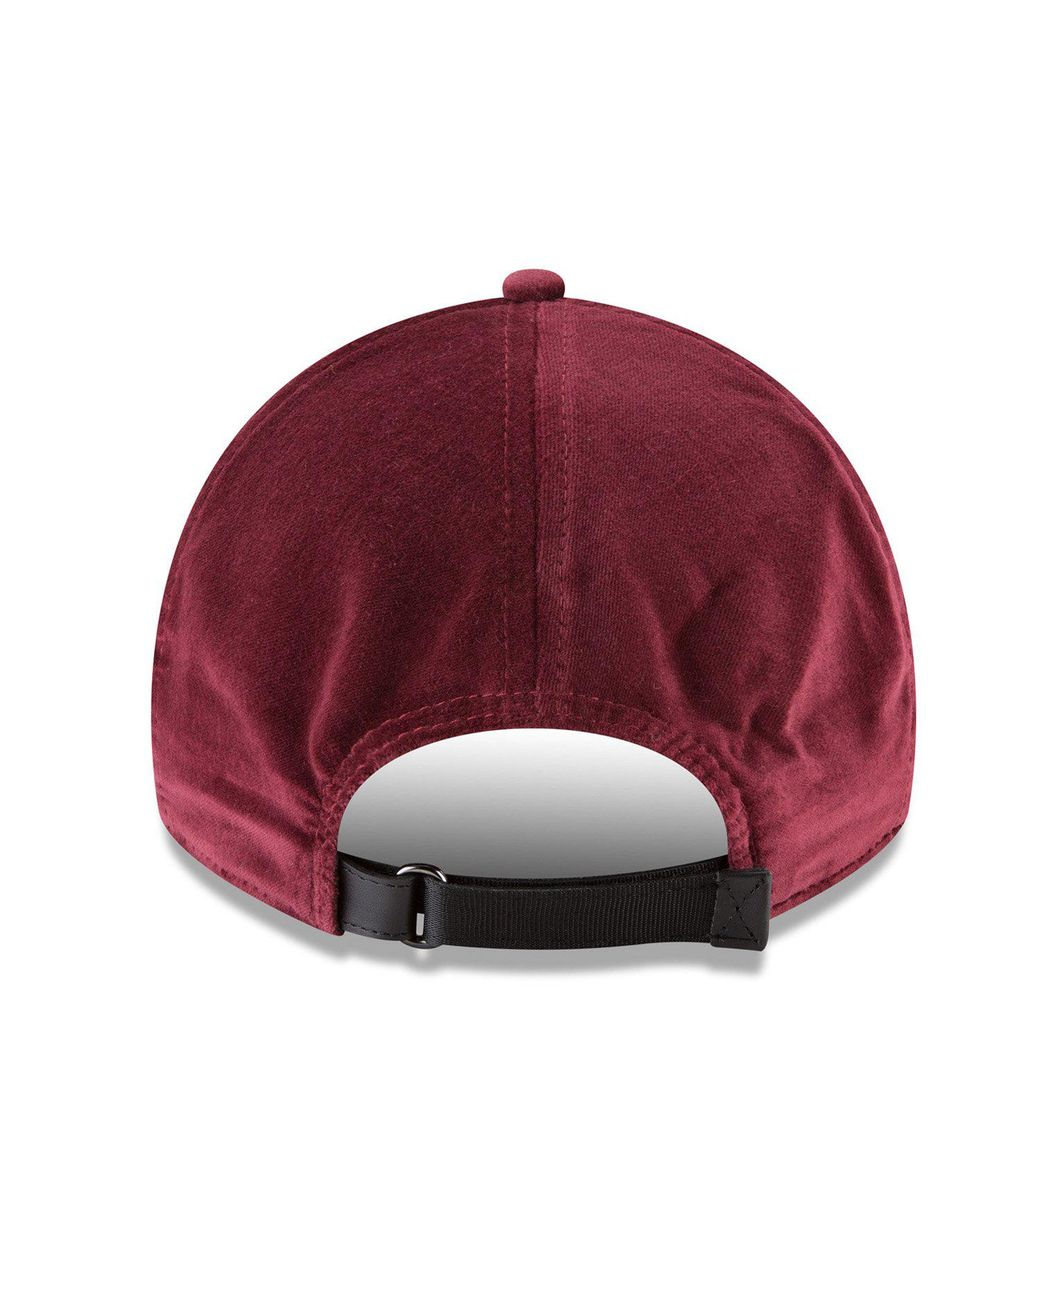 new arrival 98b4c 7396b NEW ERA HATS New Era Velvet 9twenty Cap In Maroon in Red for Men - Lyst